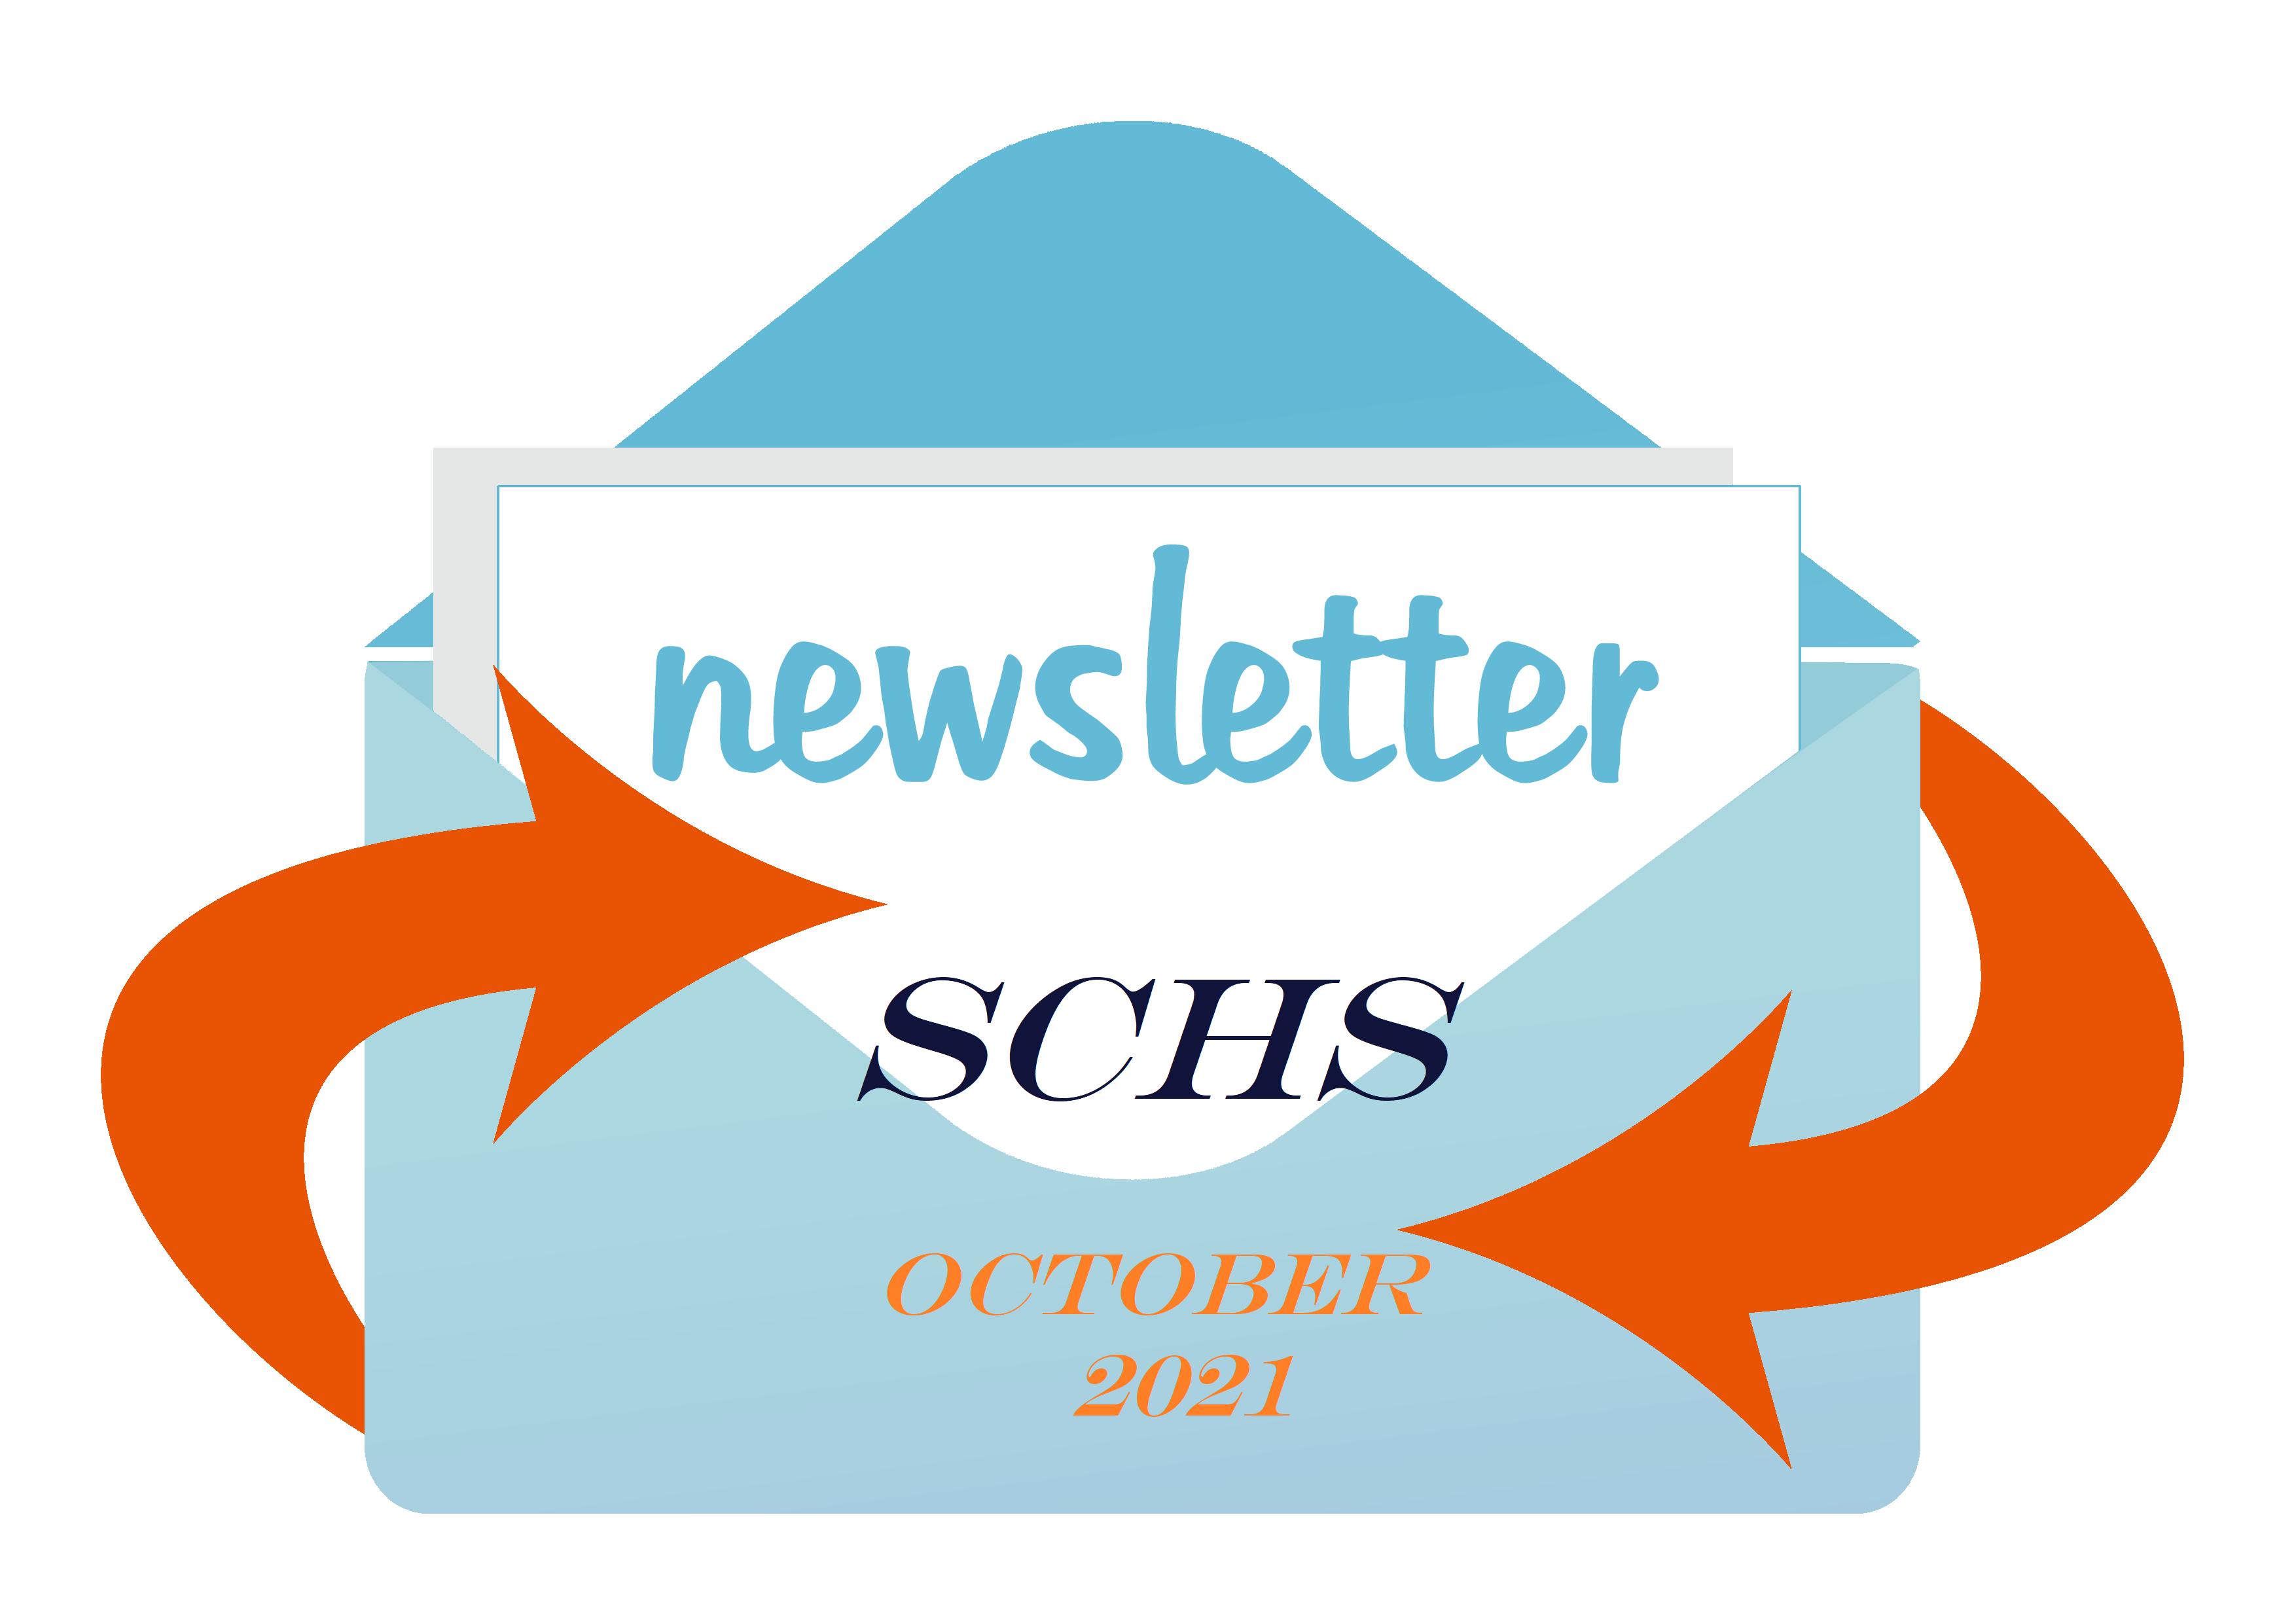 SCHS October 2021 Newsletter